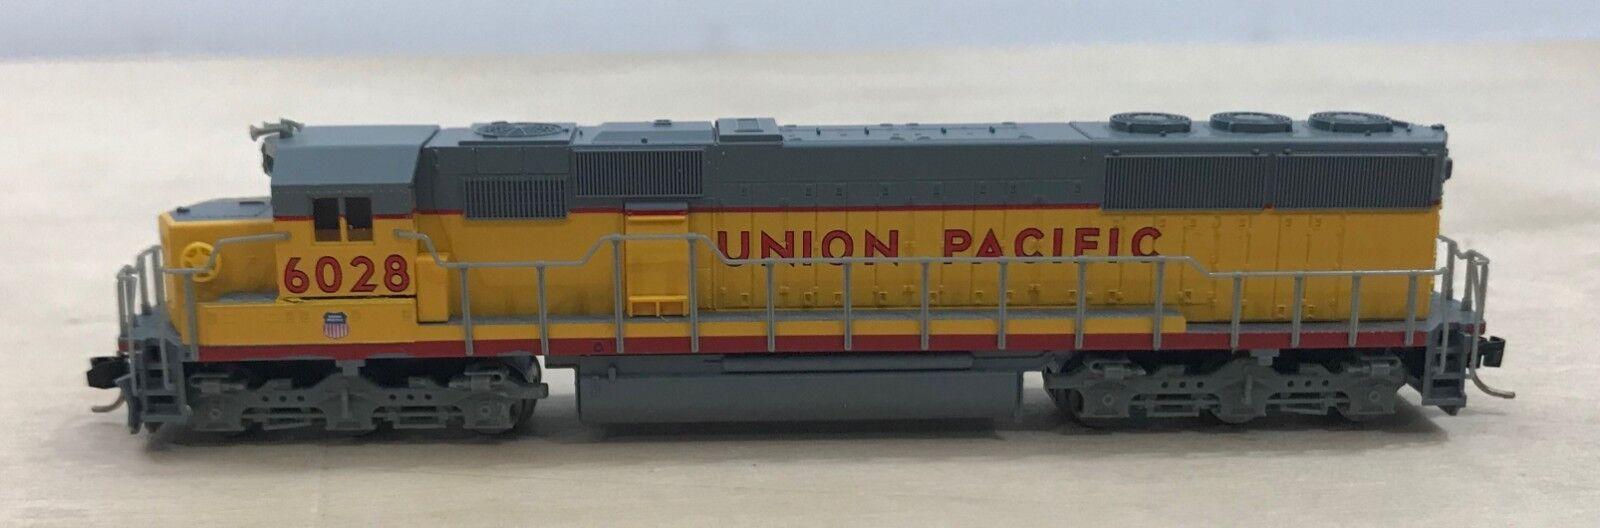 N Scale Atlas EMD SD60 Locomotive - Union Pacific